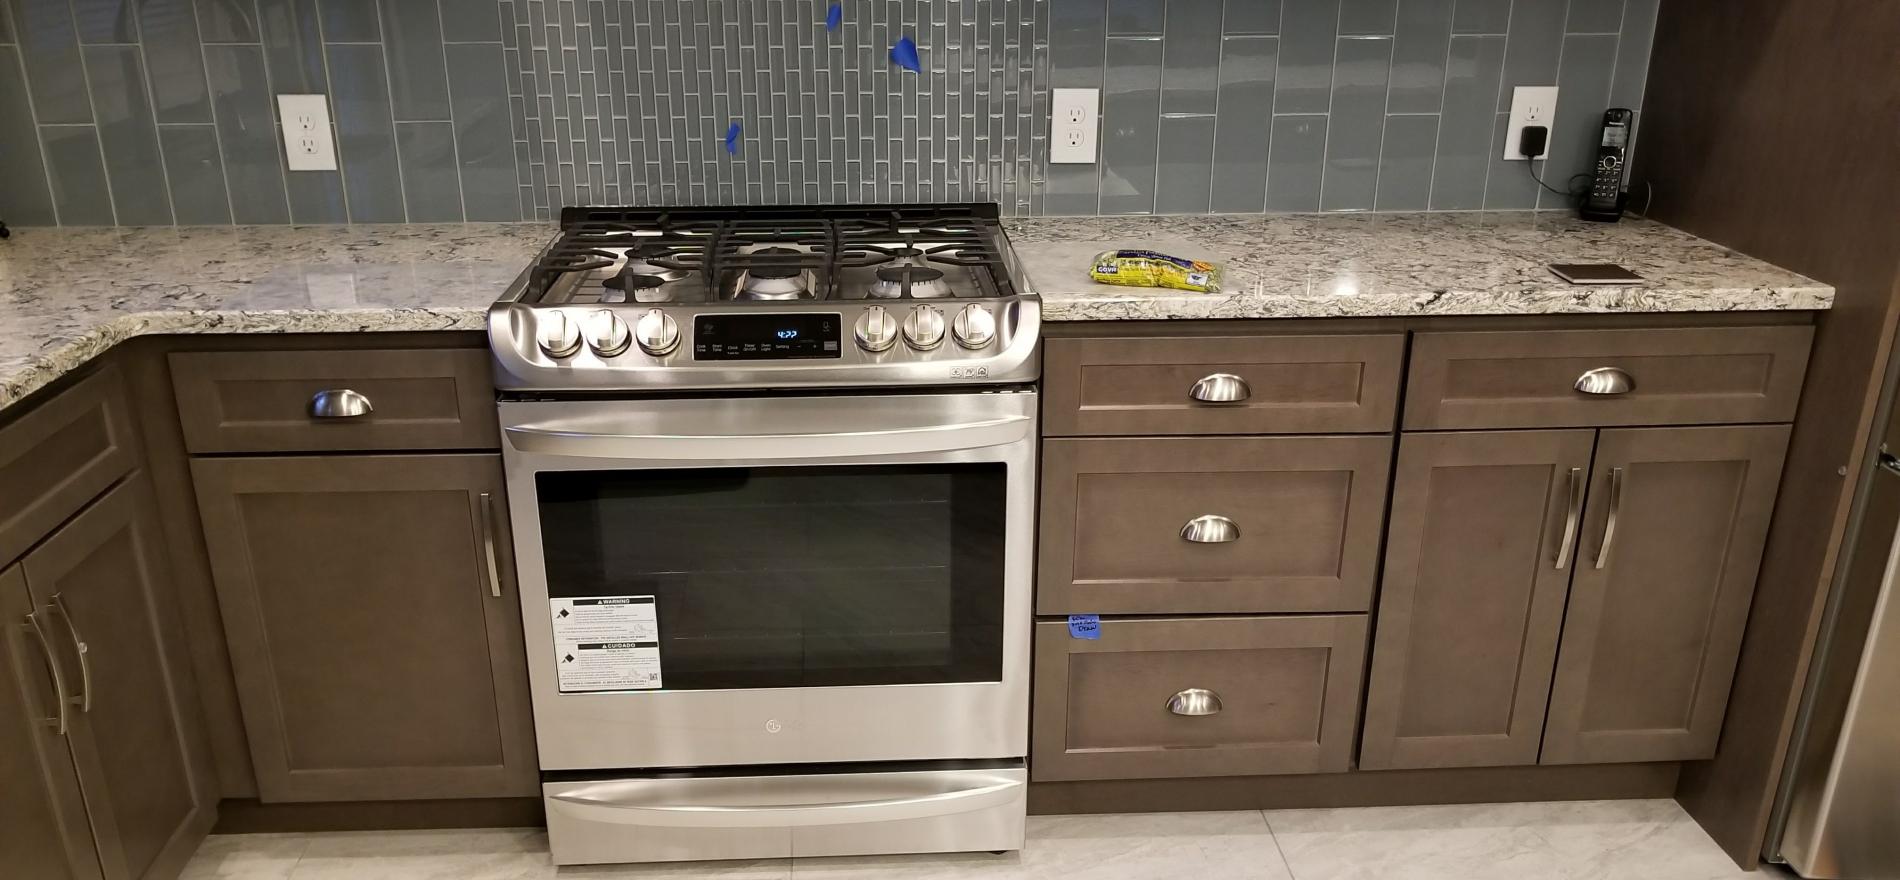 Kitchens9 Kitchen Remodel Photos